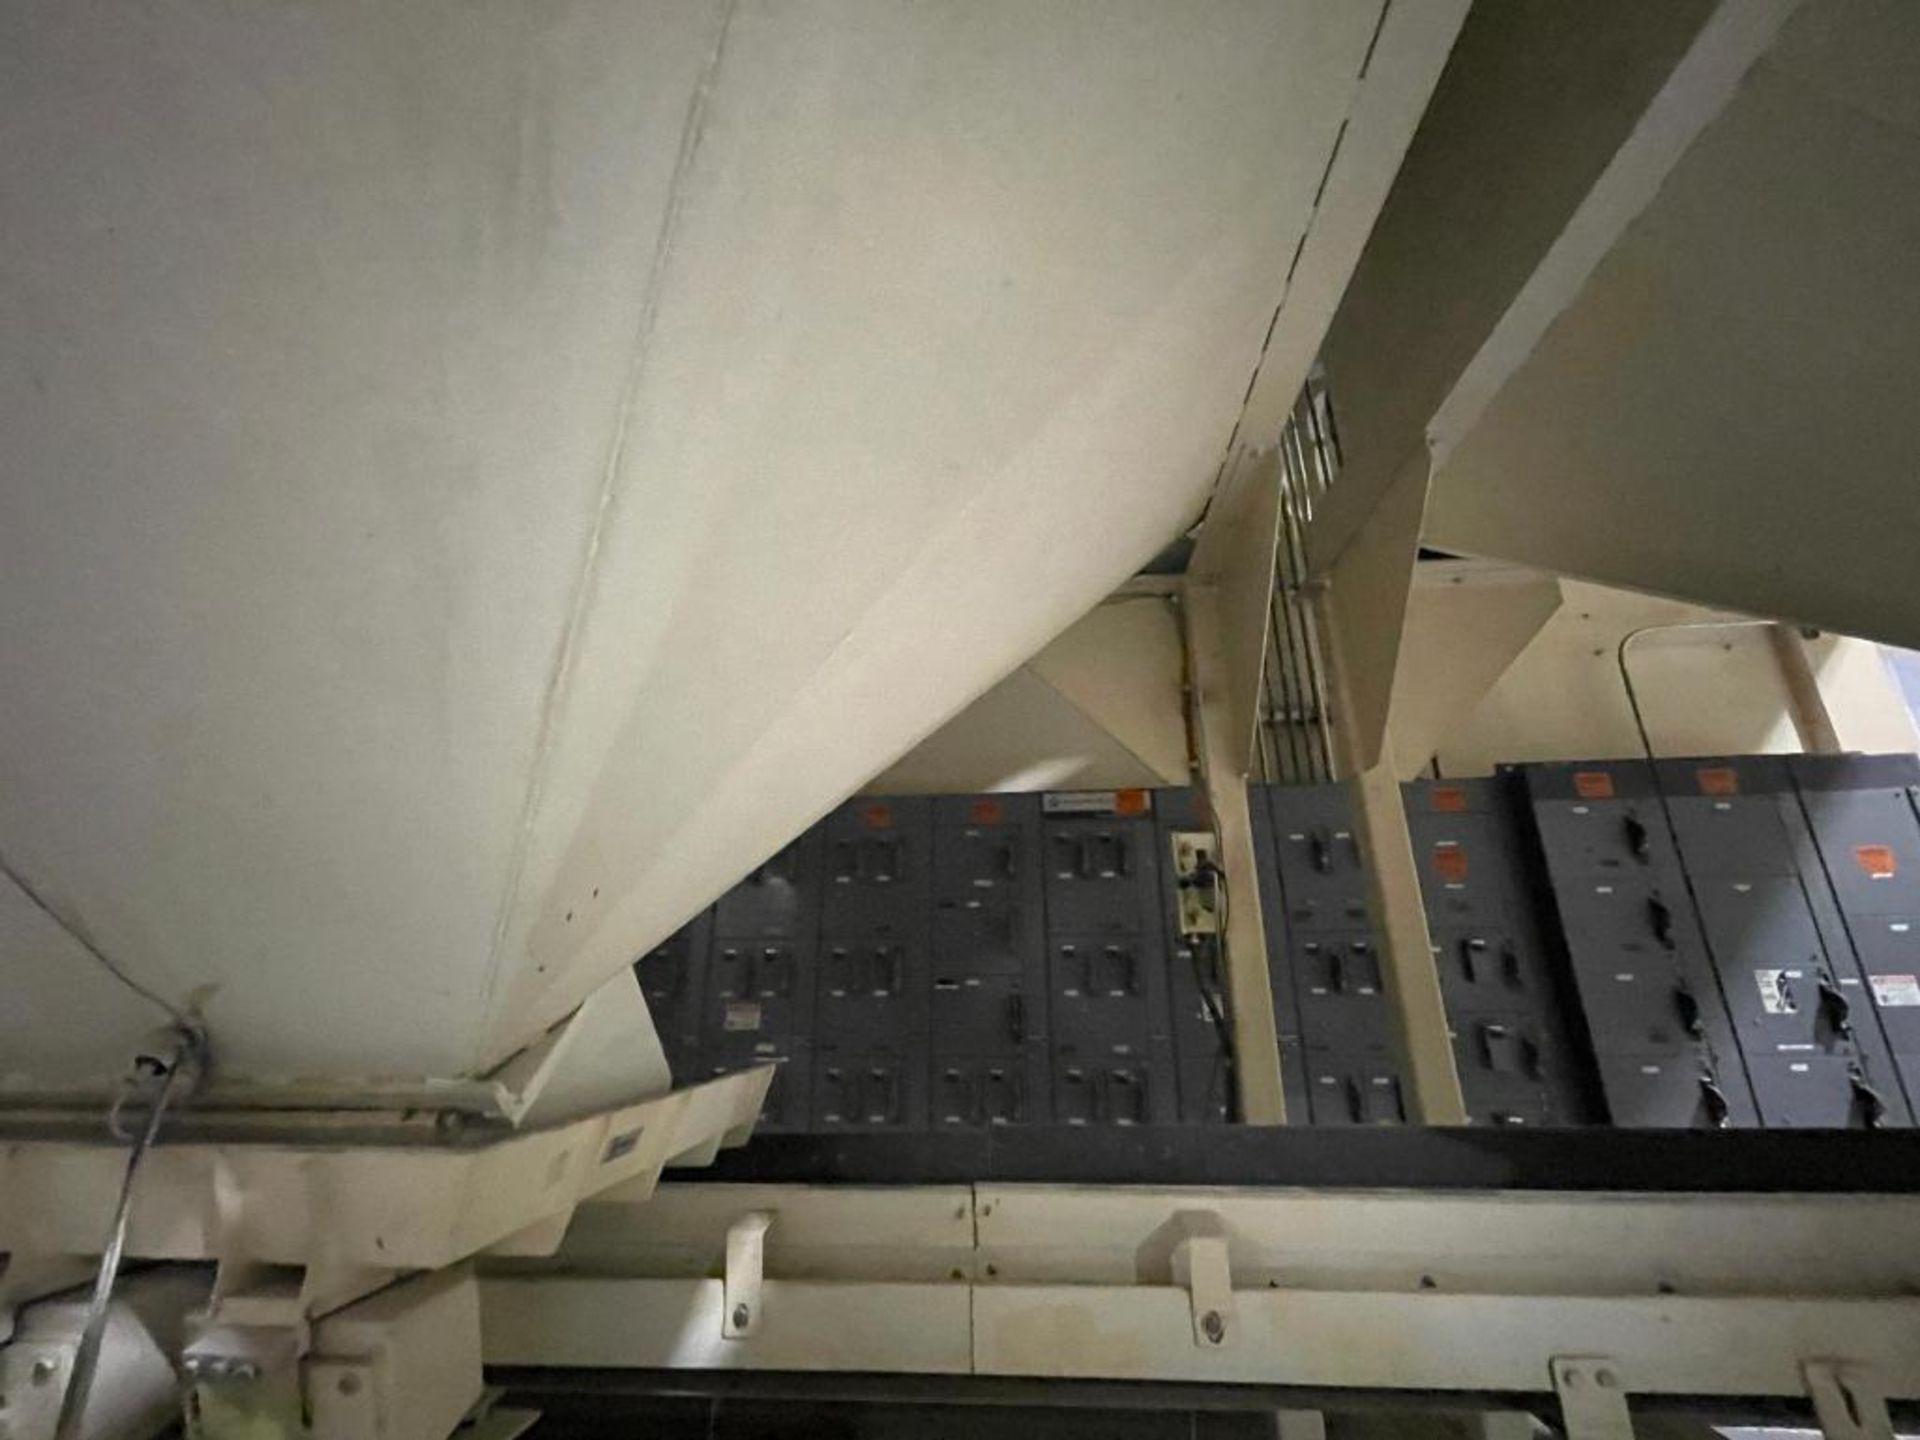 Aseeco mild steel cone bottom bulk storage bin - Image 16 of 31